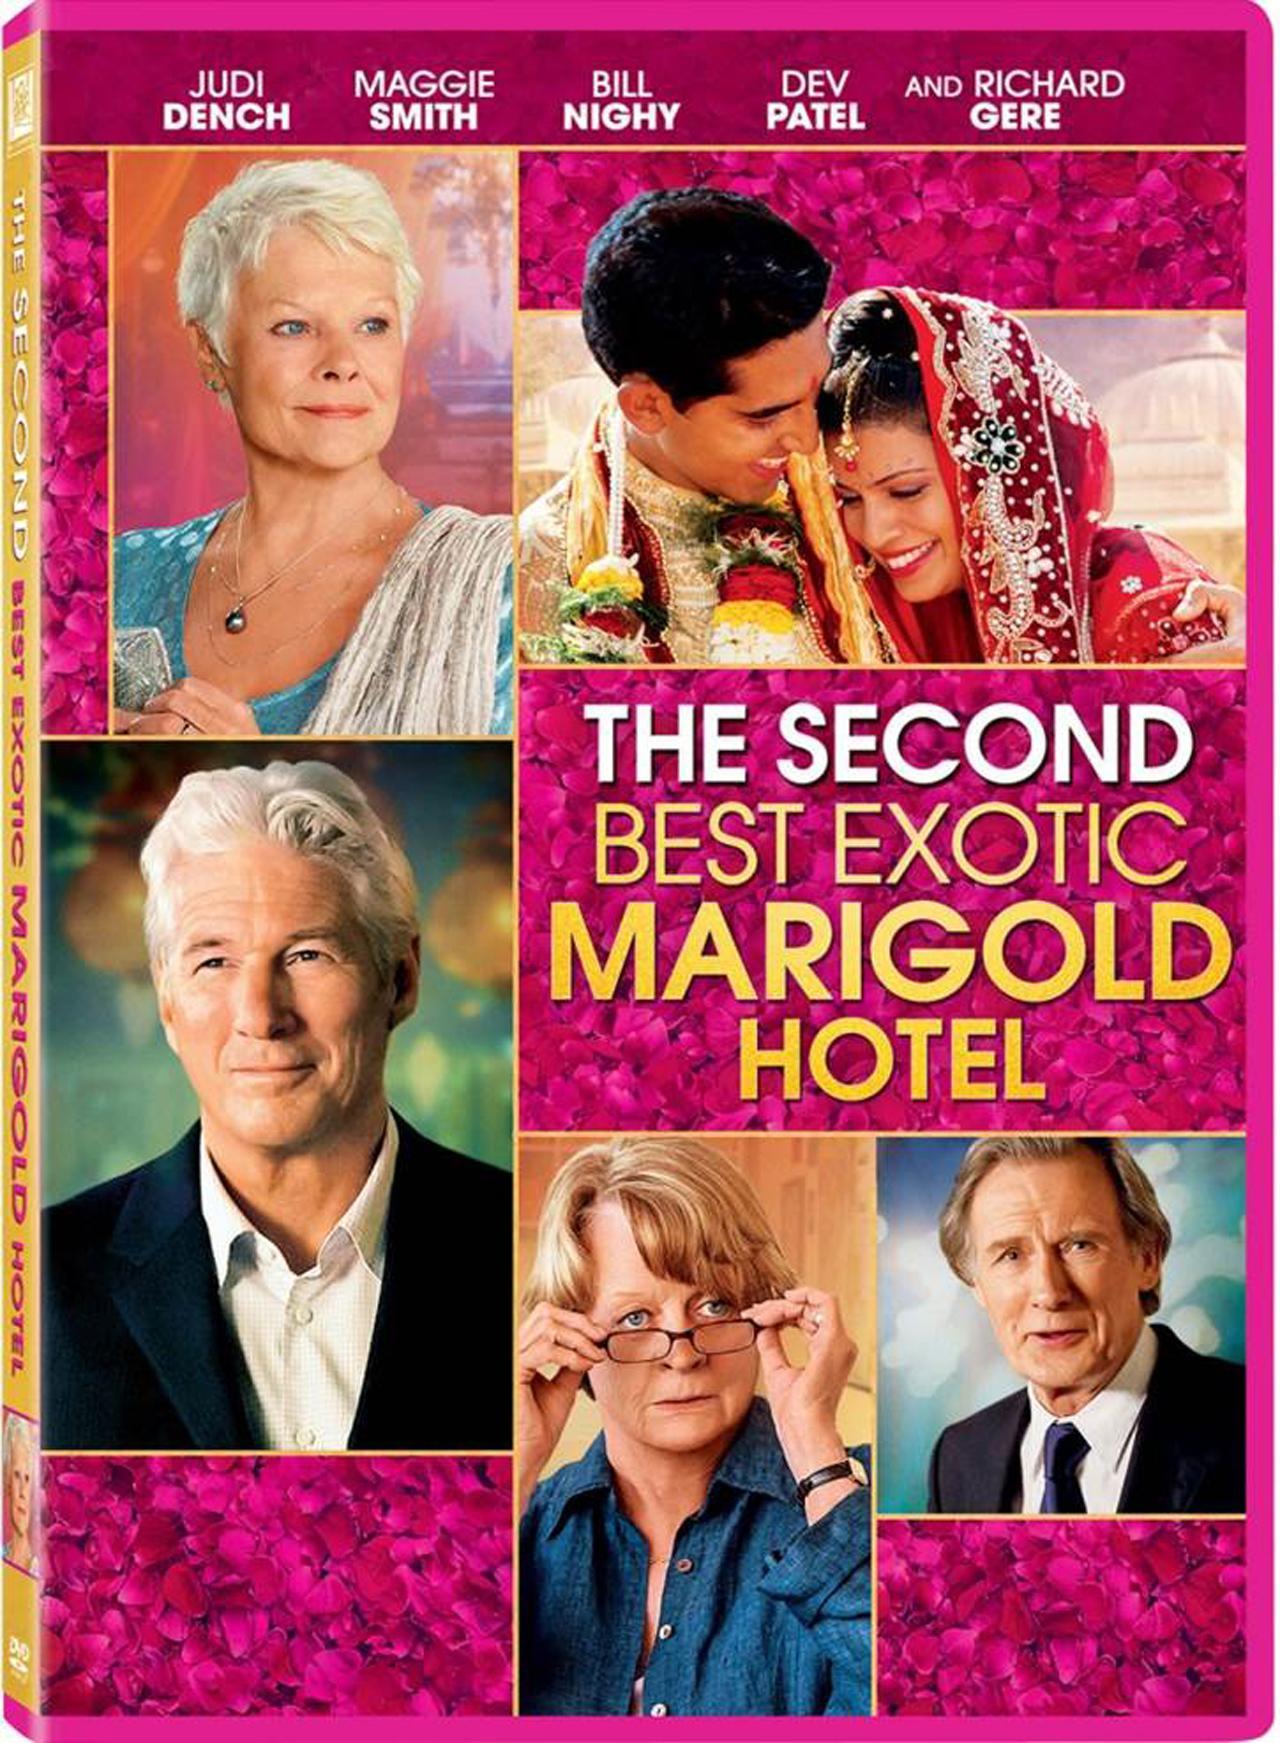 The Second Best Exotic Marigold Hotel : โรงแรมสวรรค์ อัศจรรย์หัวใจ 2